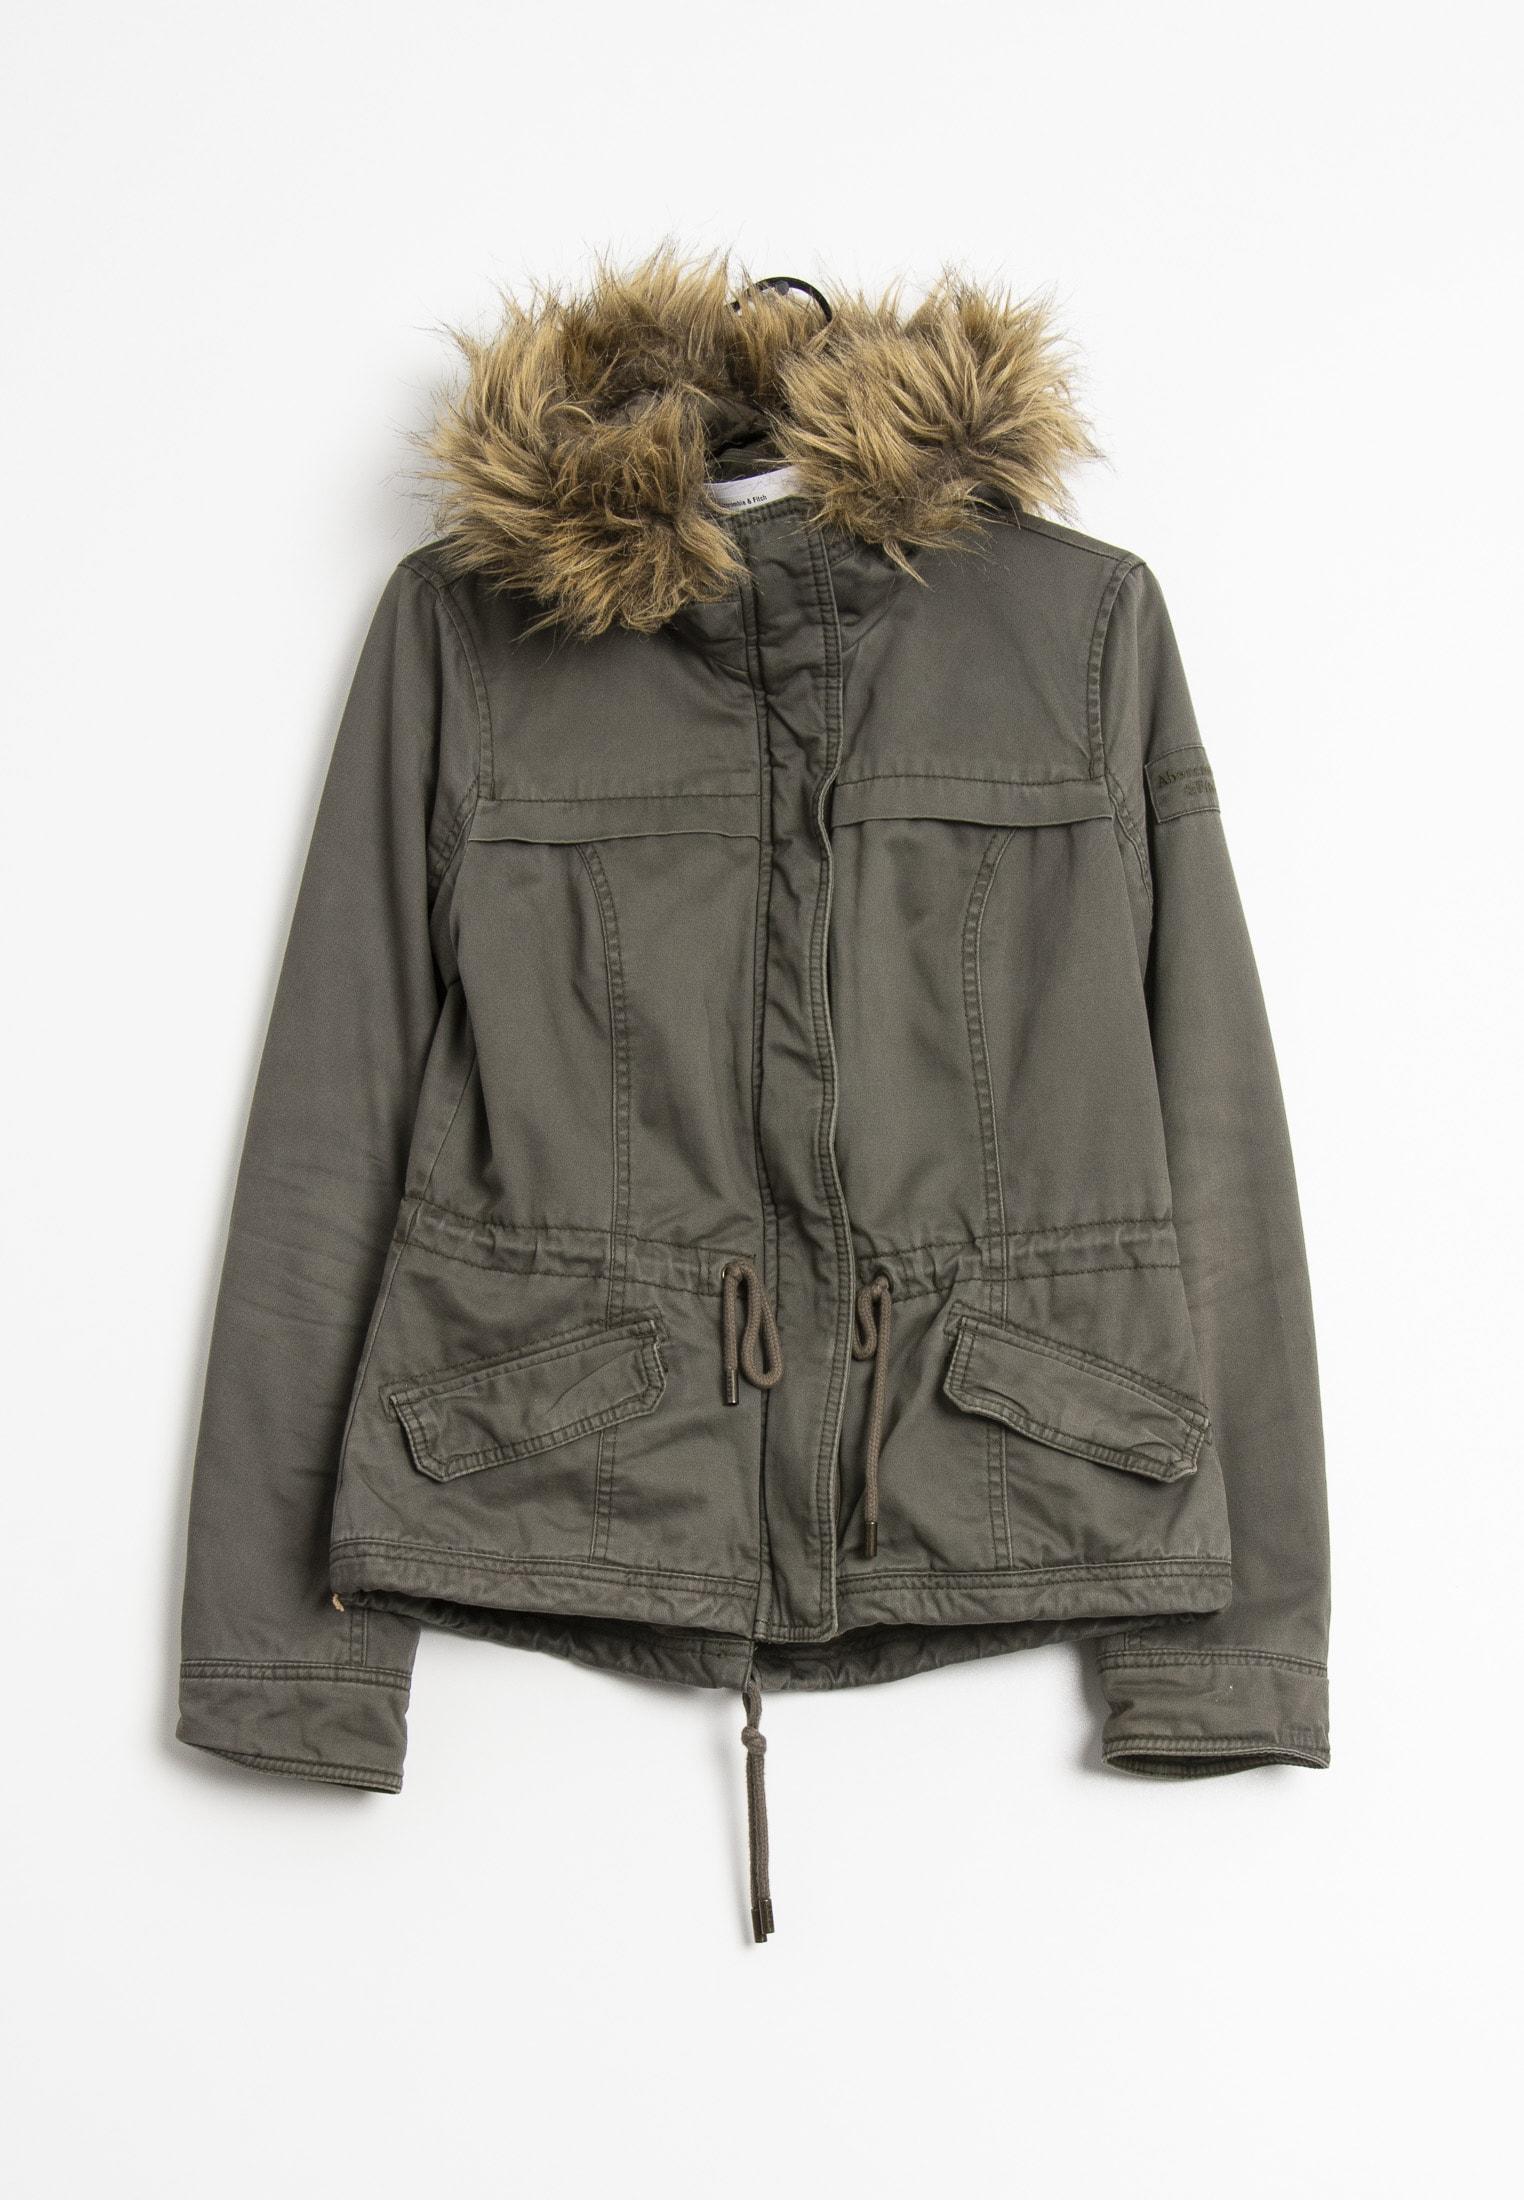 Abercrombie & Fitch Winterjacke Grün Gr.M